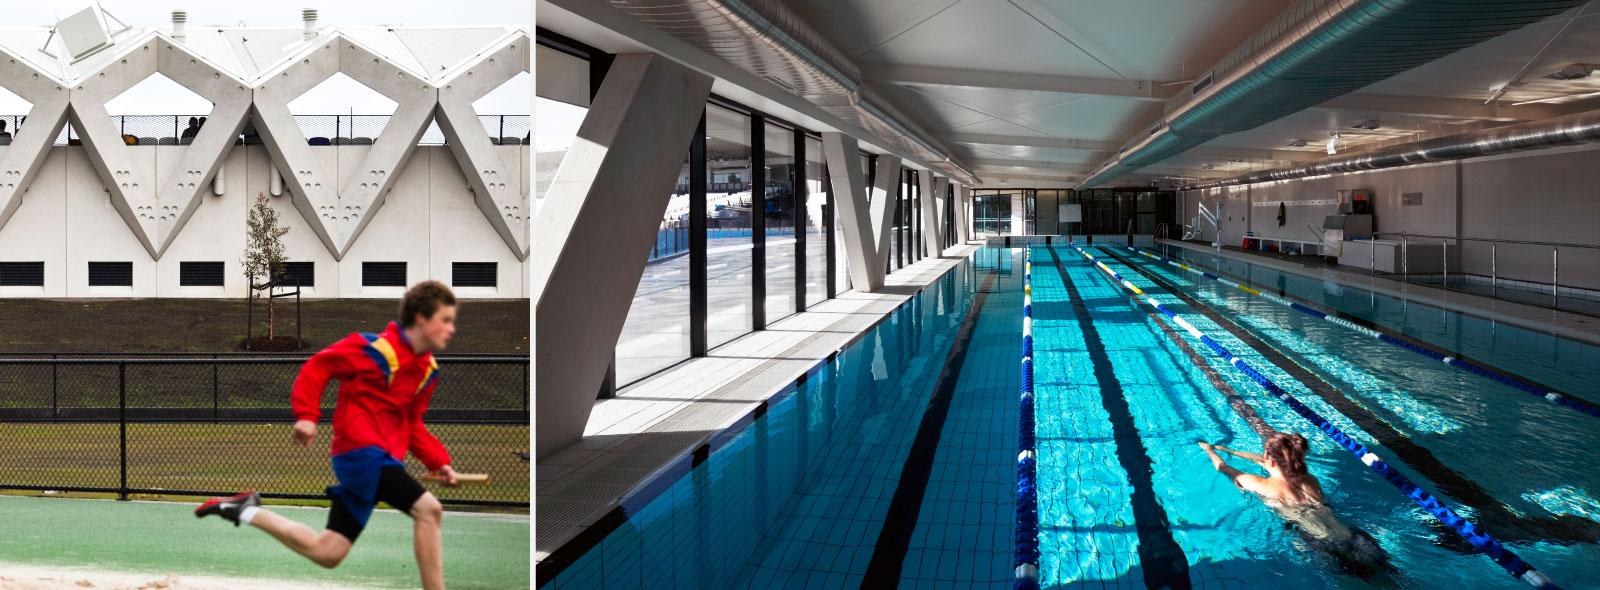 H2o-Architects-Melbourne-Lakeside-Stadium-Albert-Park-05